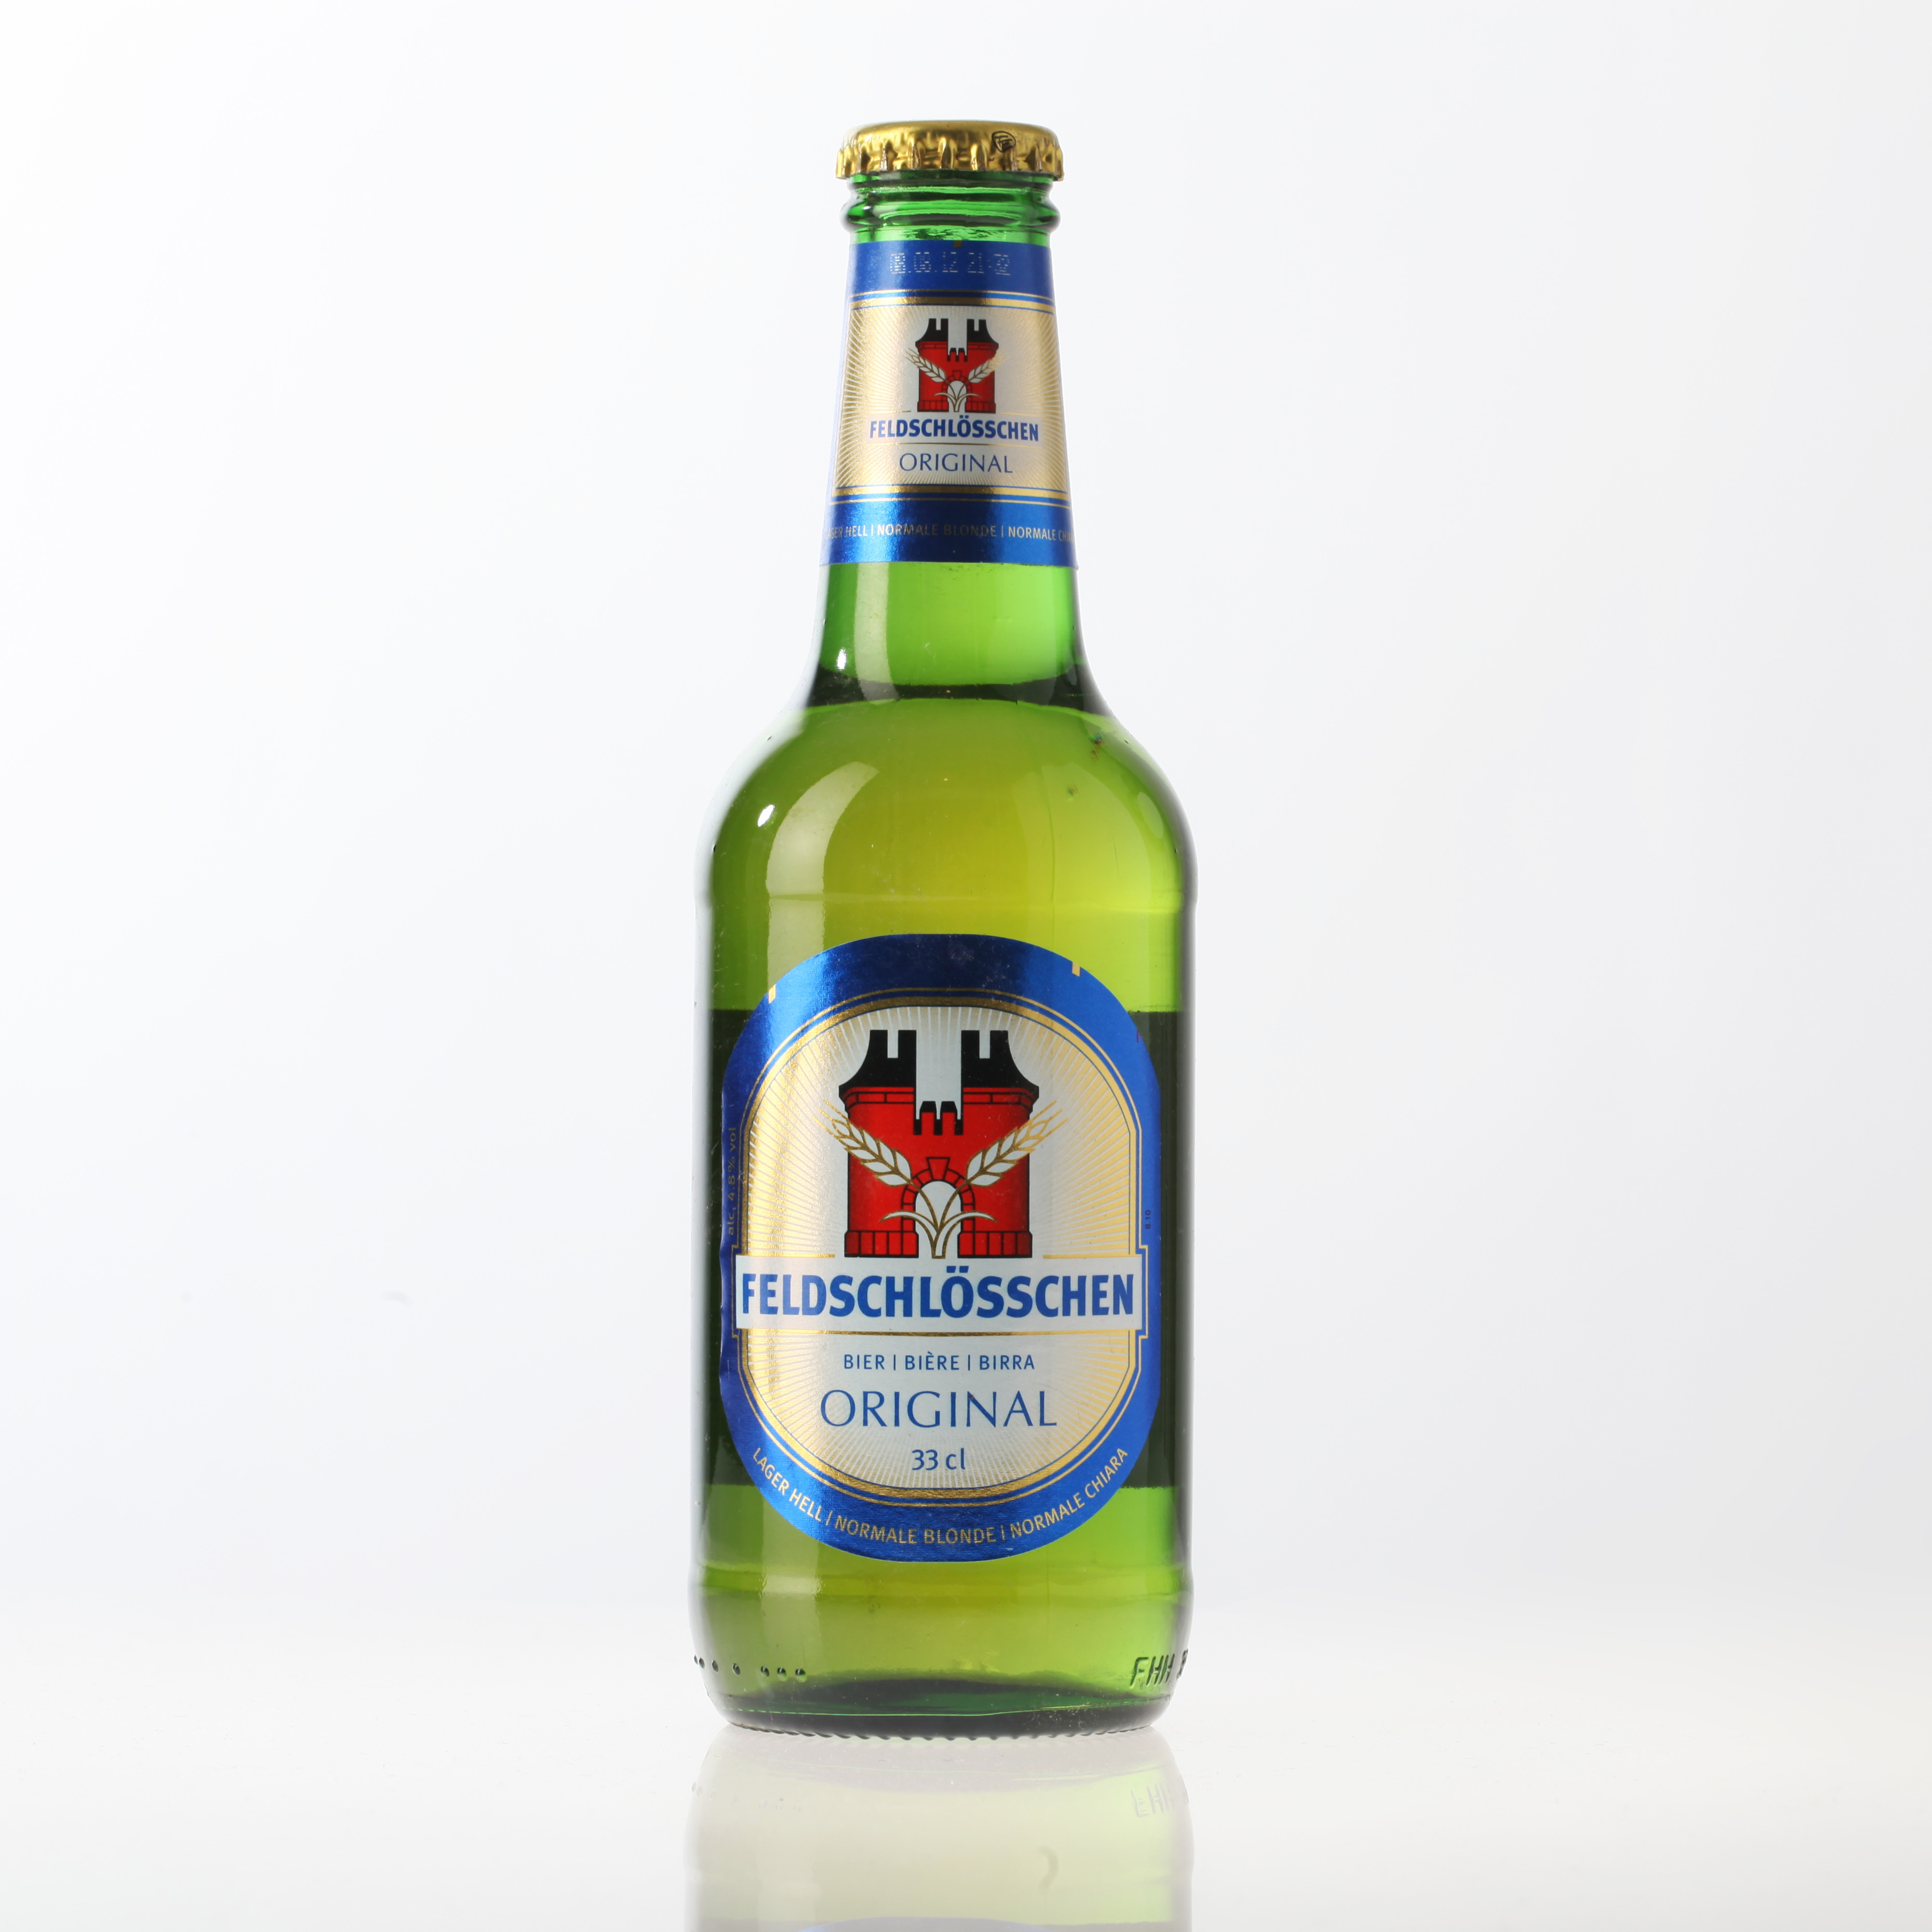 How To Build >> File:Feldschlösschen Bier aus Flasche.jpg - Wikimedia Commons